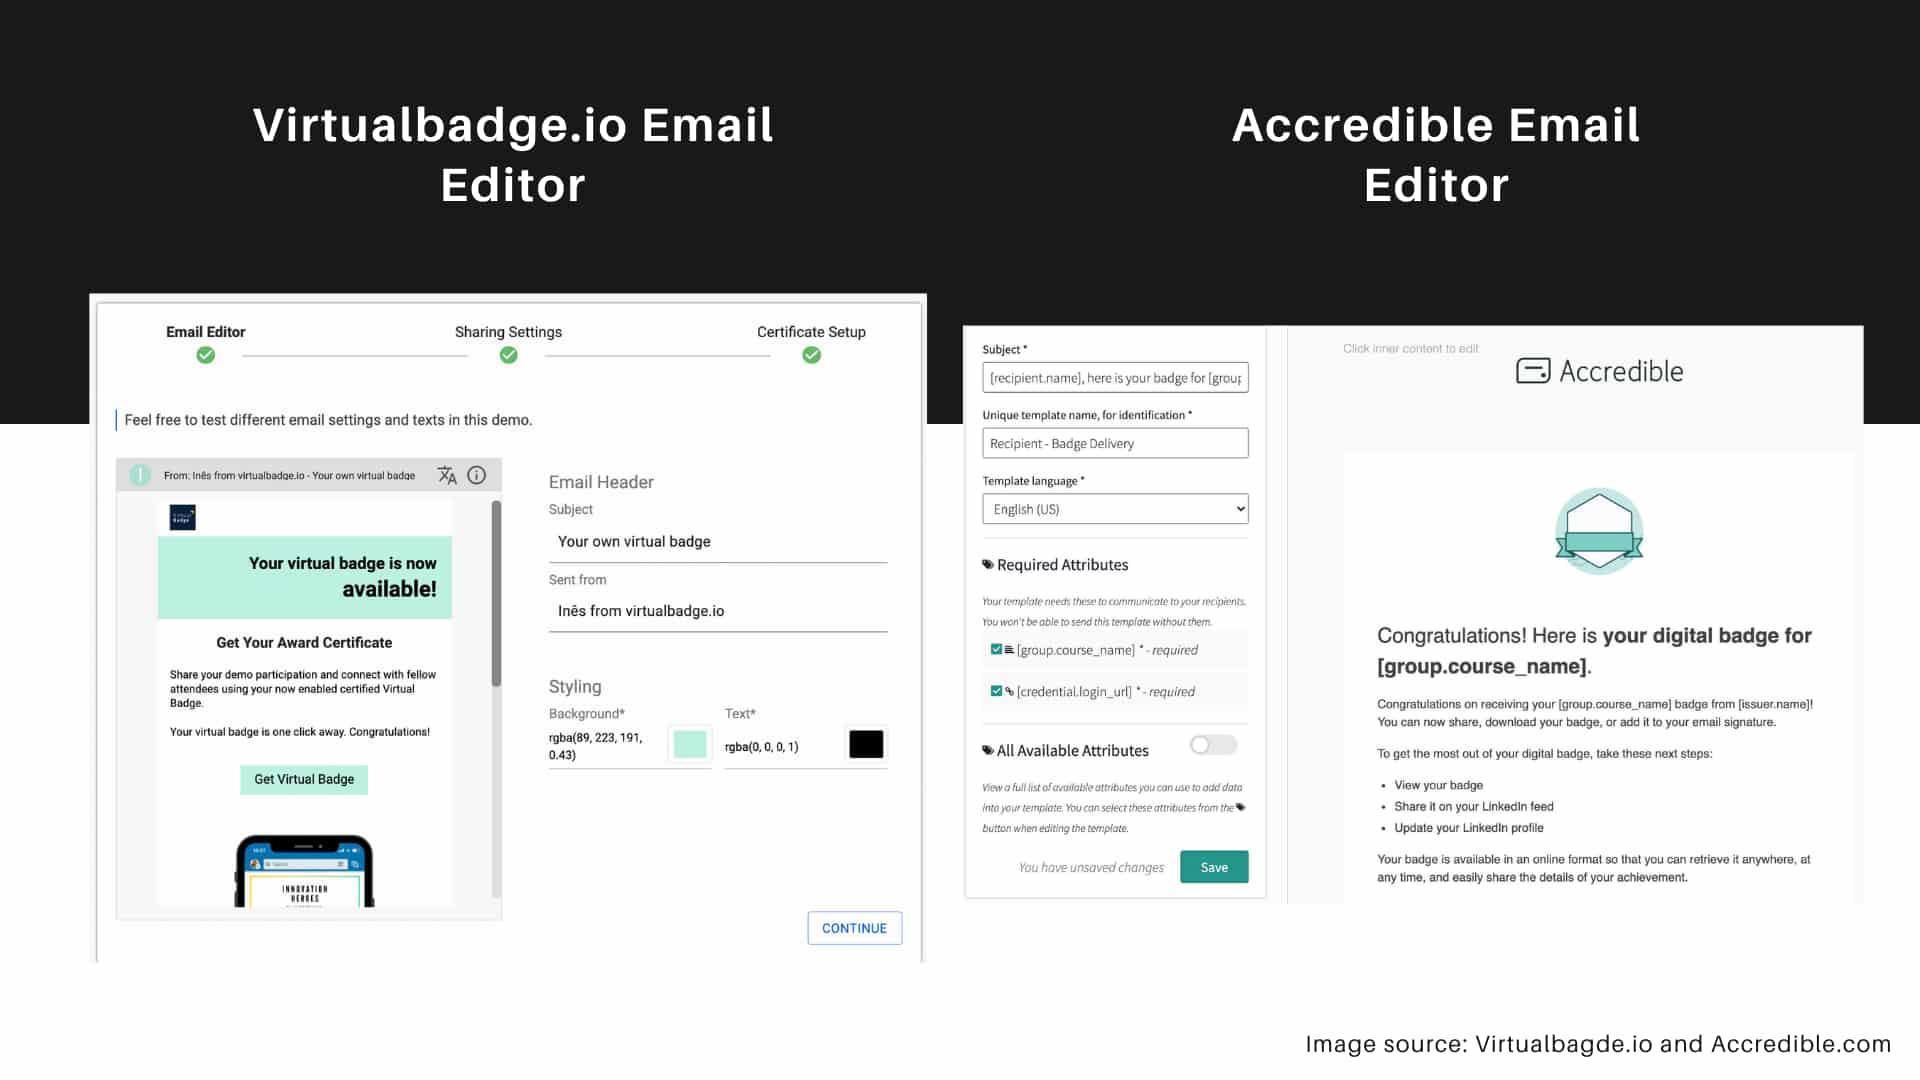 Email editor feature - Virtualbadge.io vs. Accredible